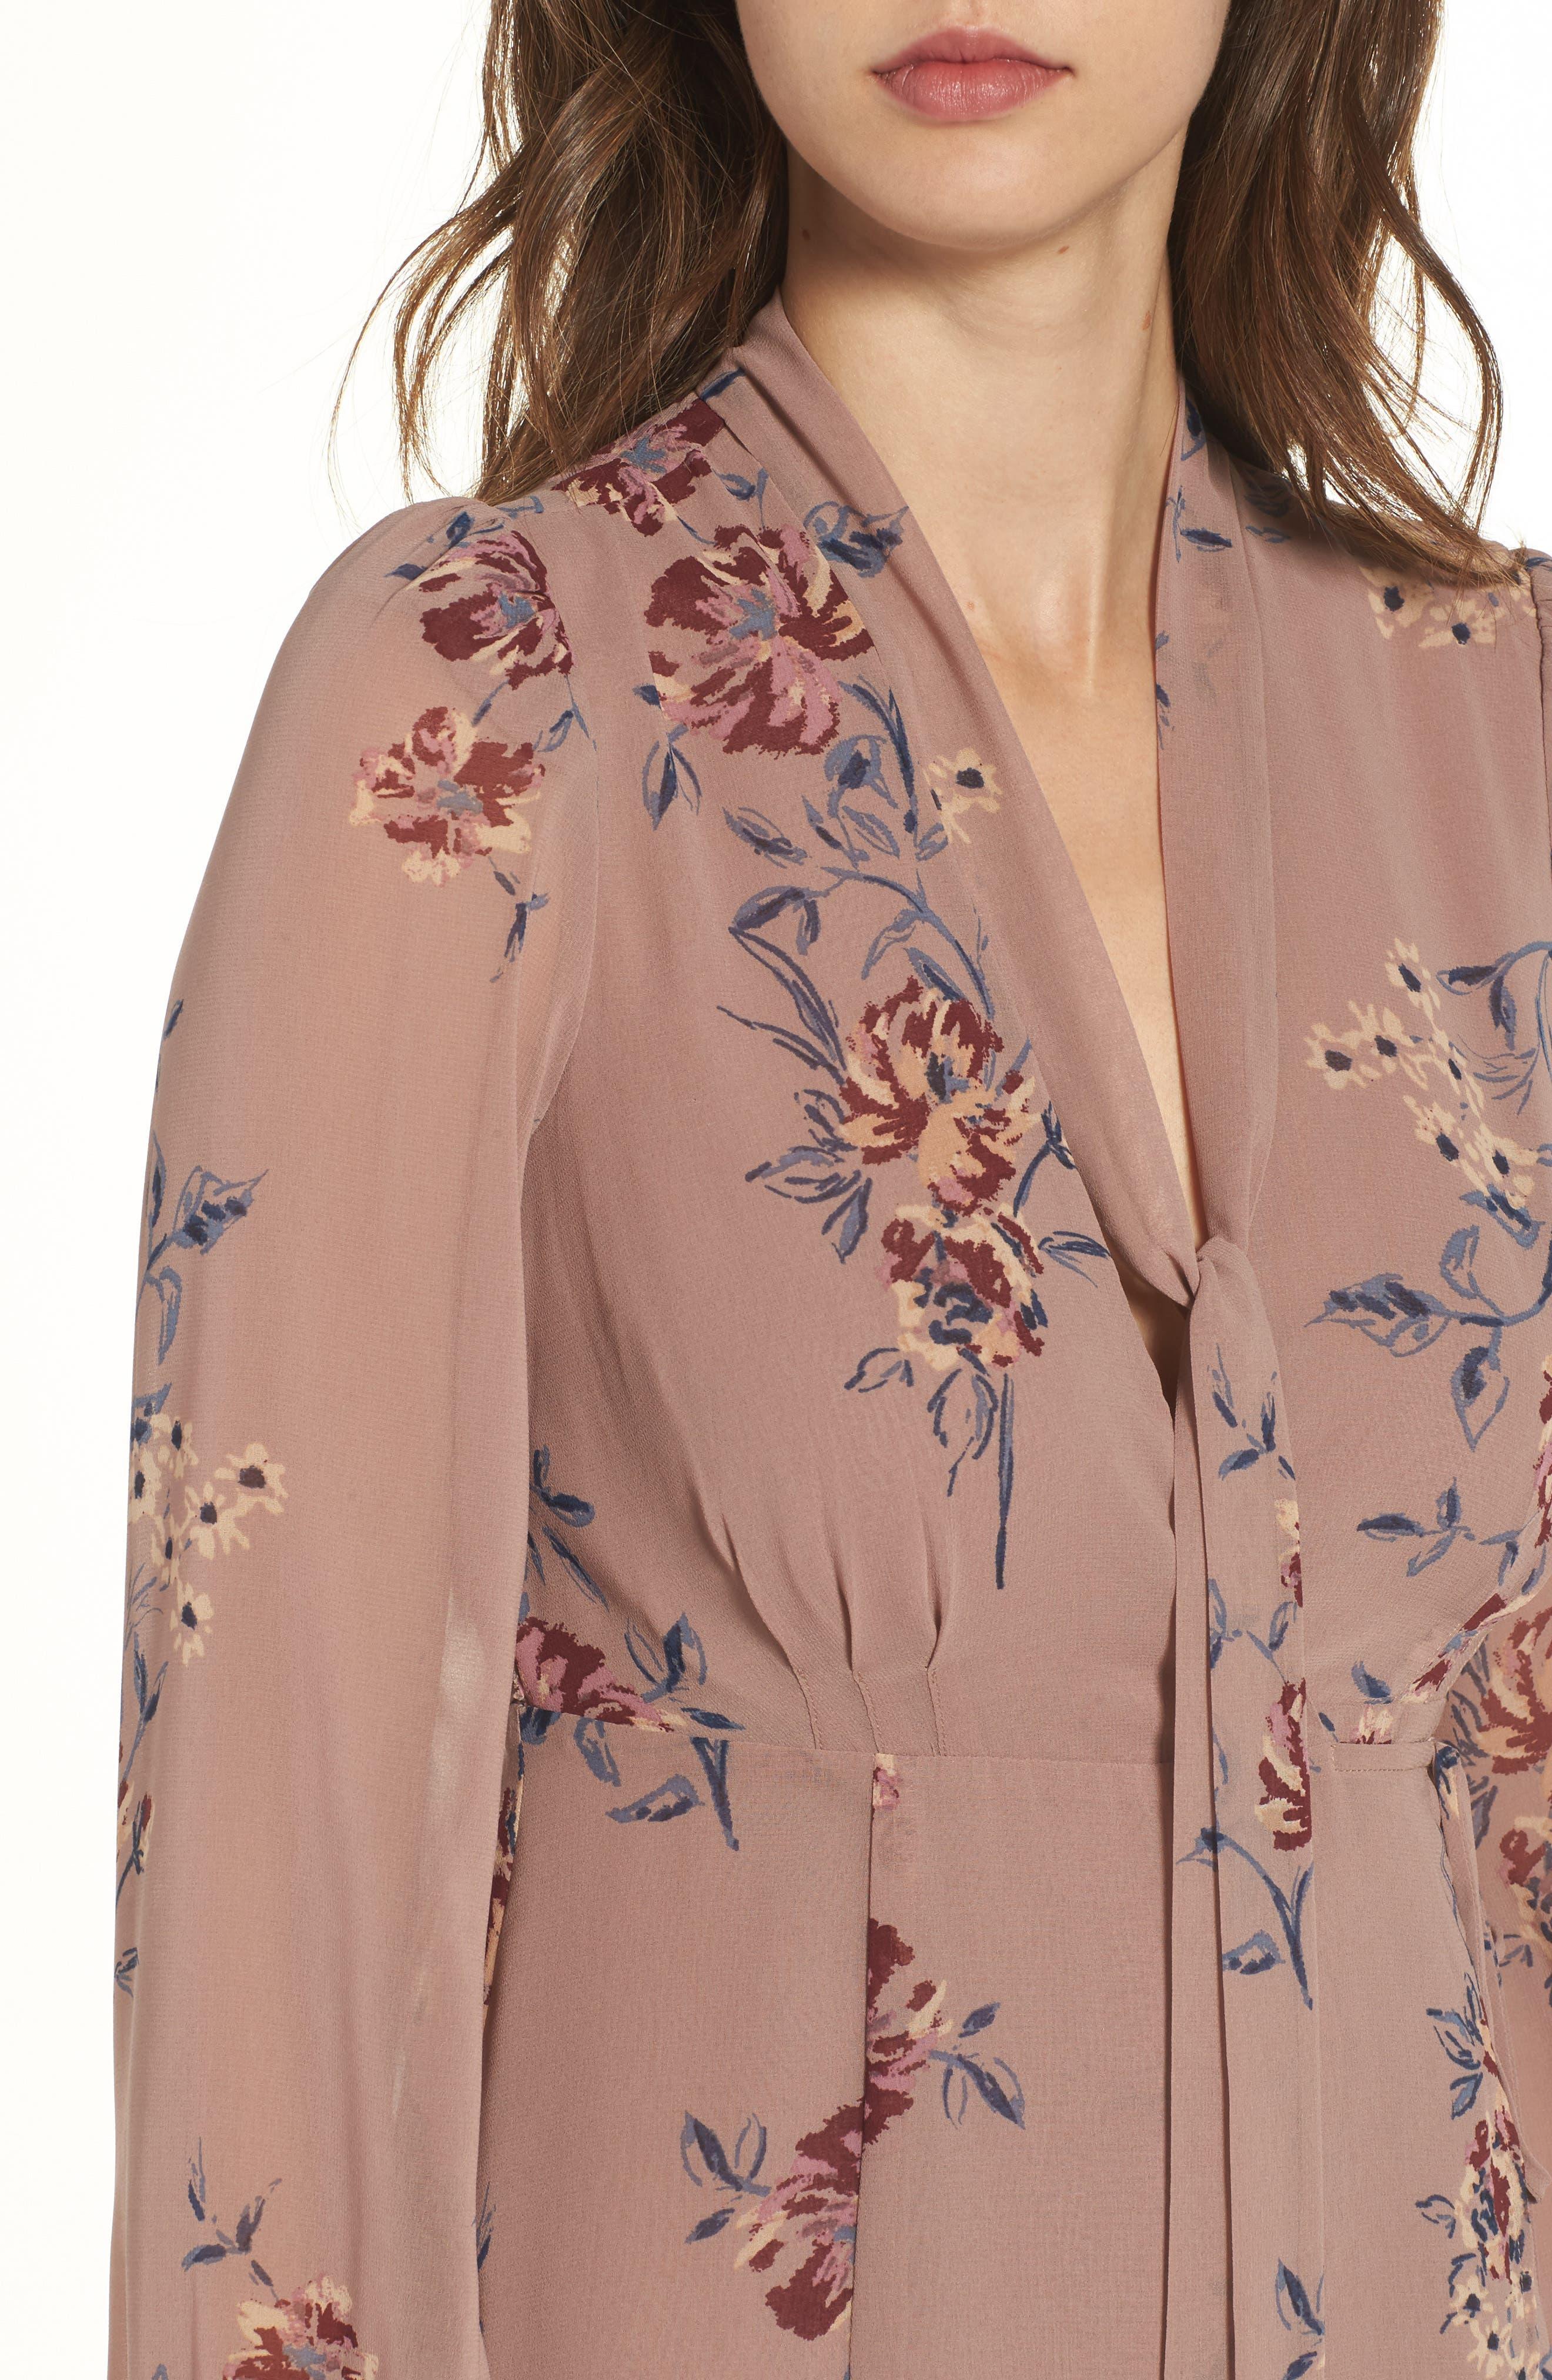 Tyra A-Line Dress,                             Alternate thumbnail 8, color,